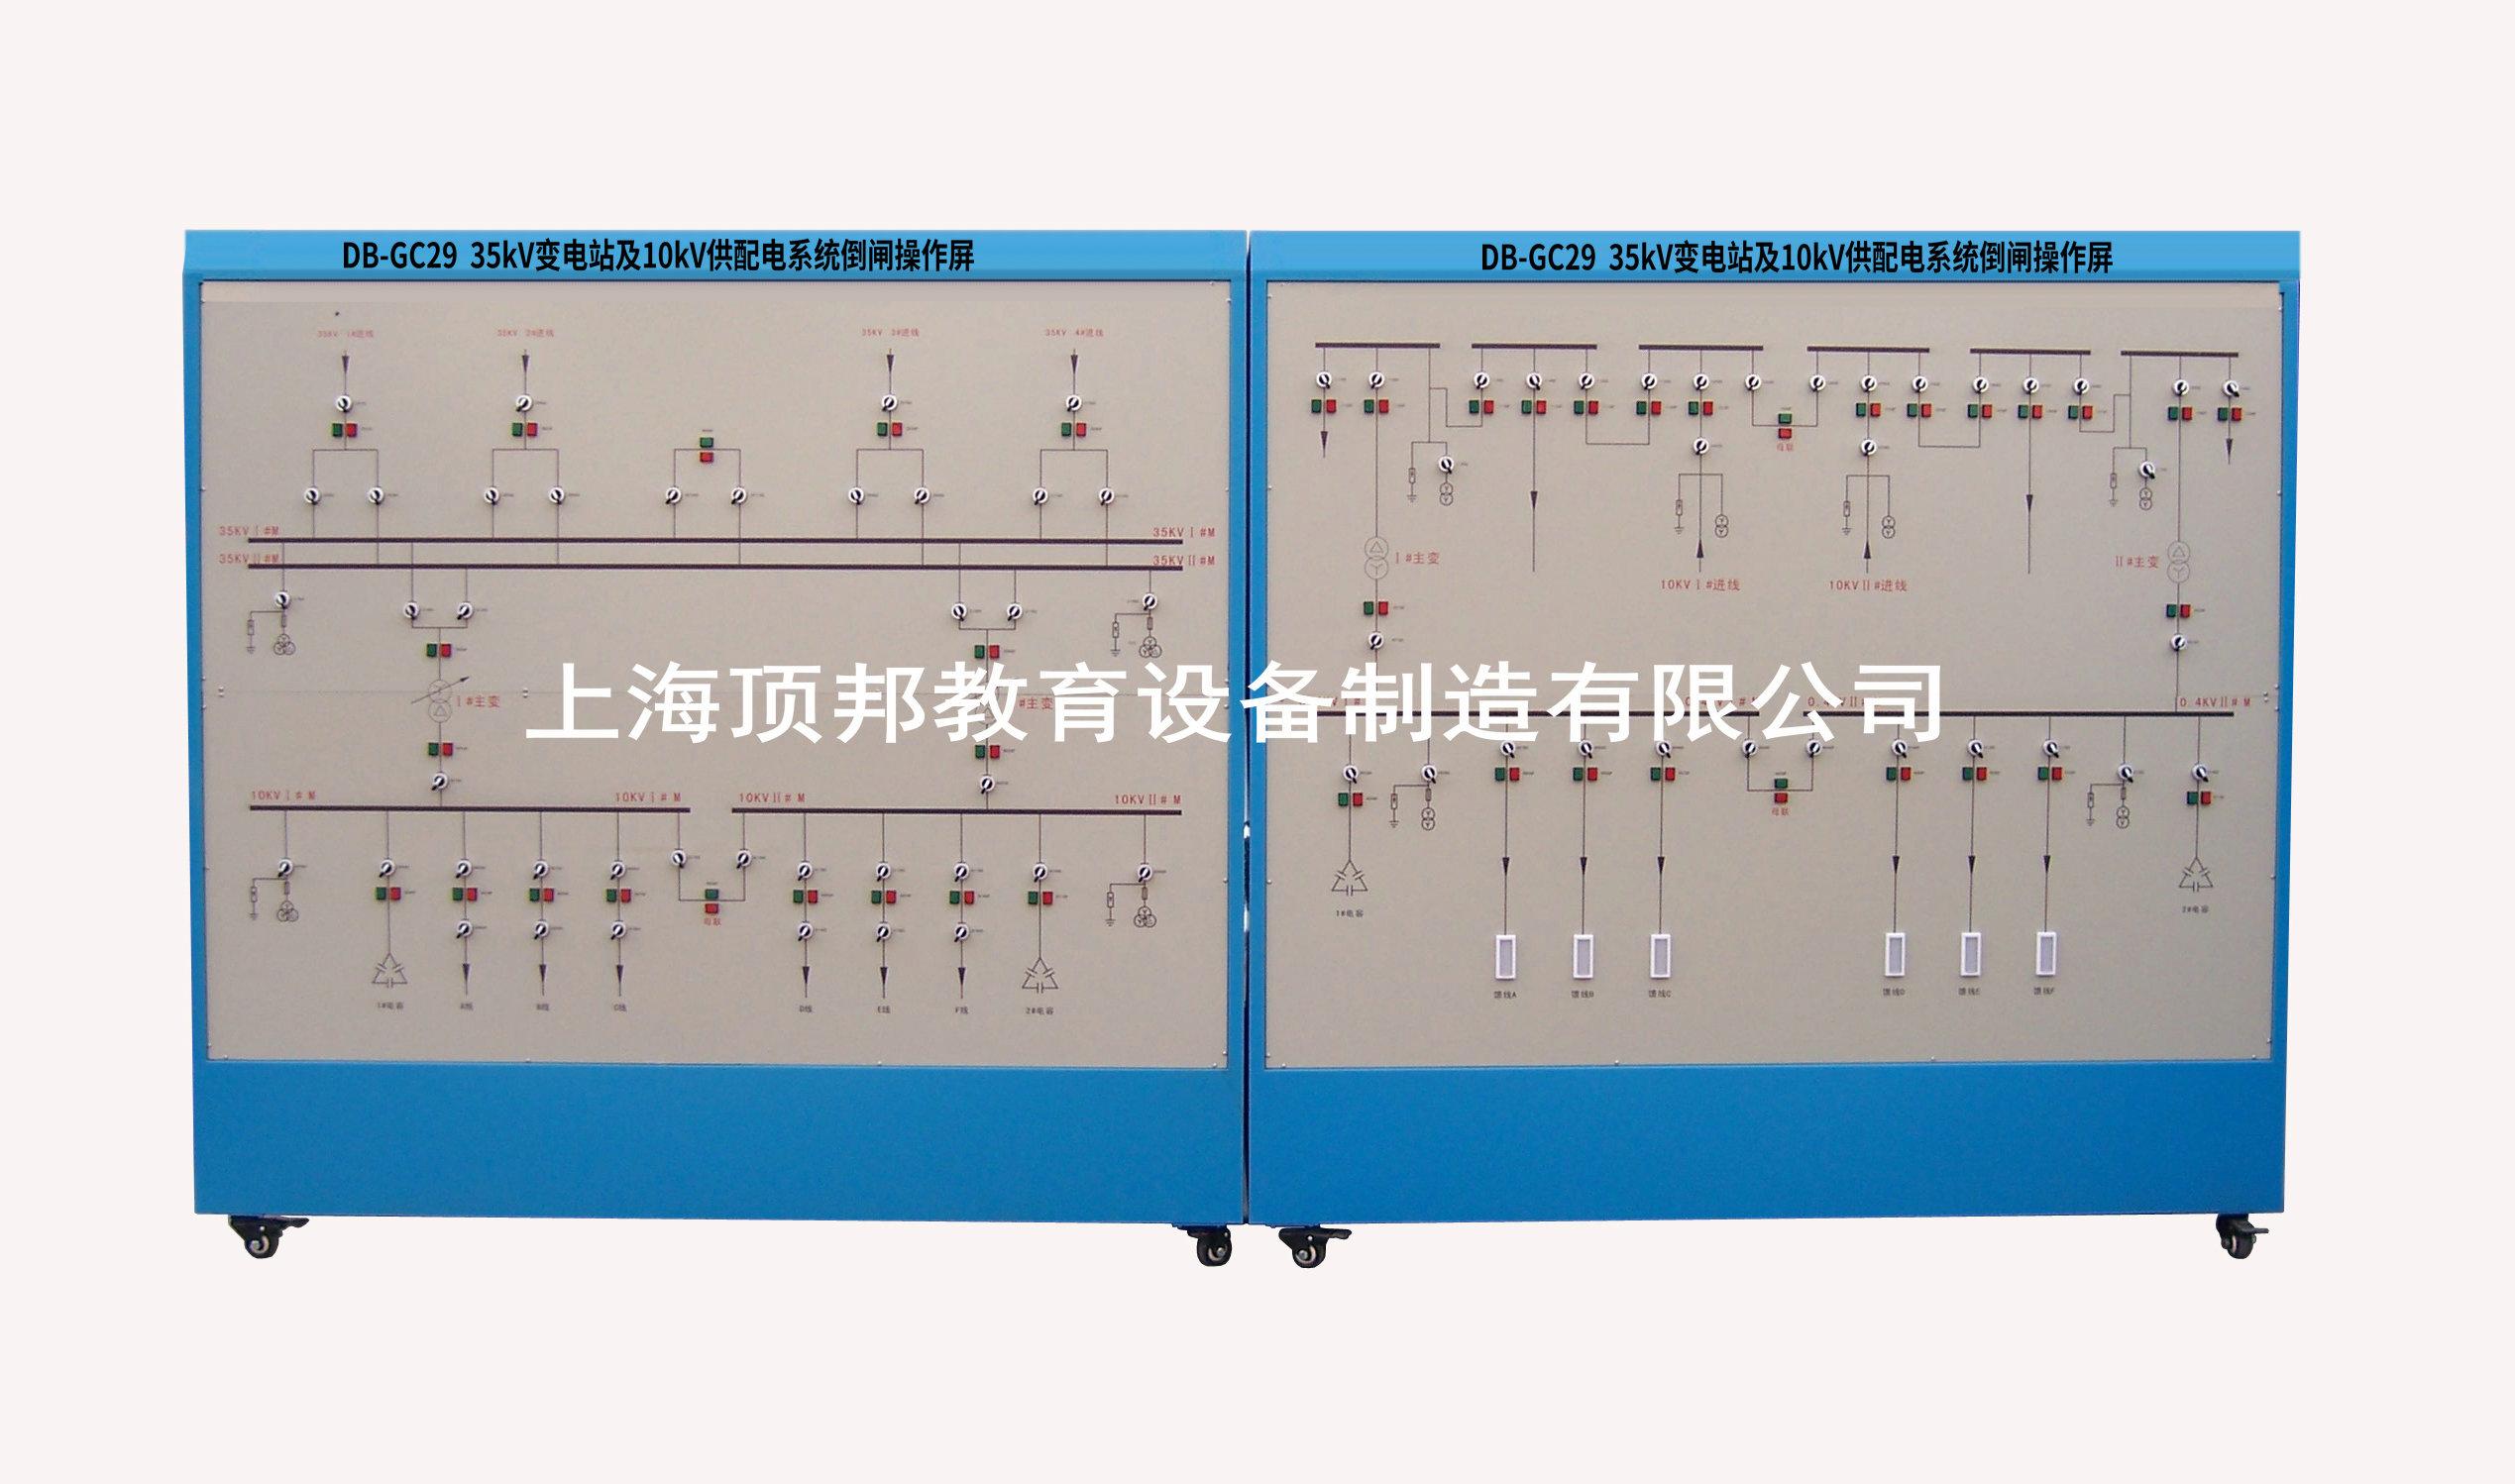 35kV变电站及10kV供配电系统倒闸操作屏